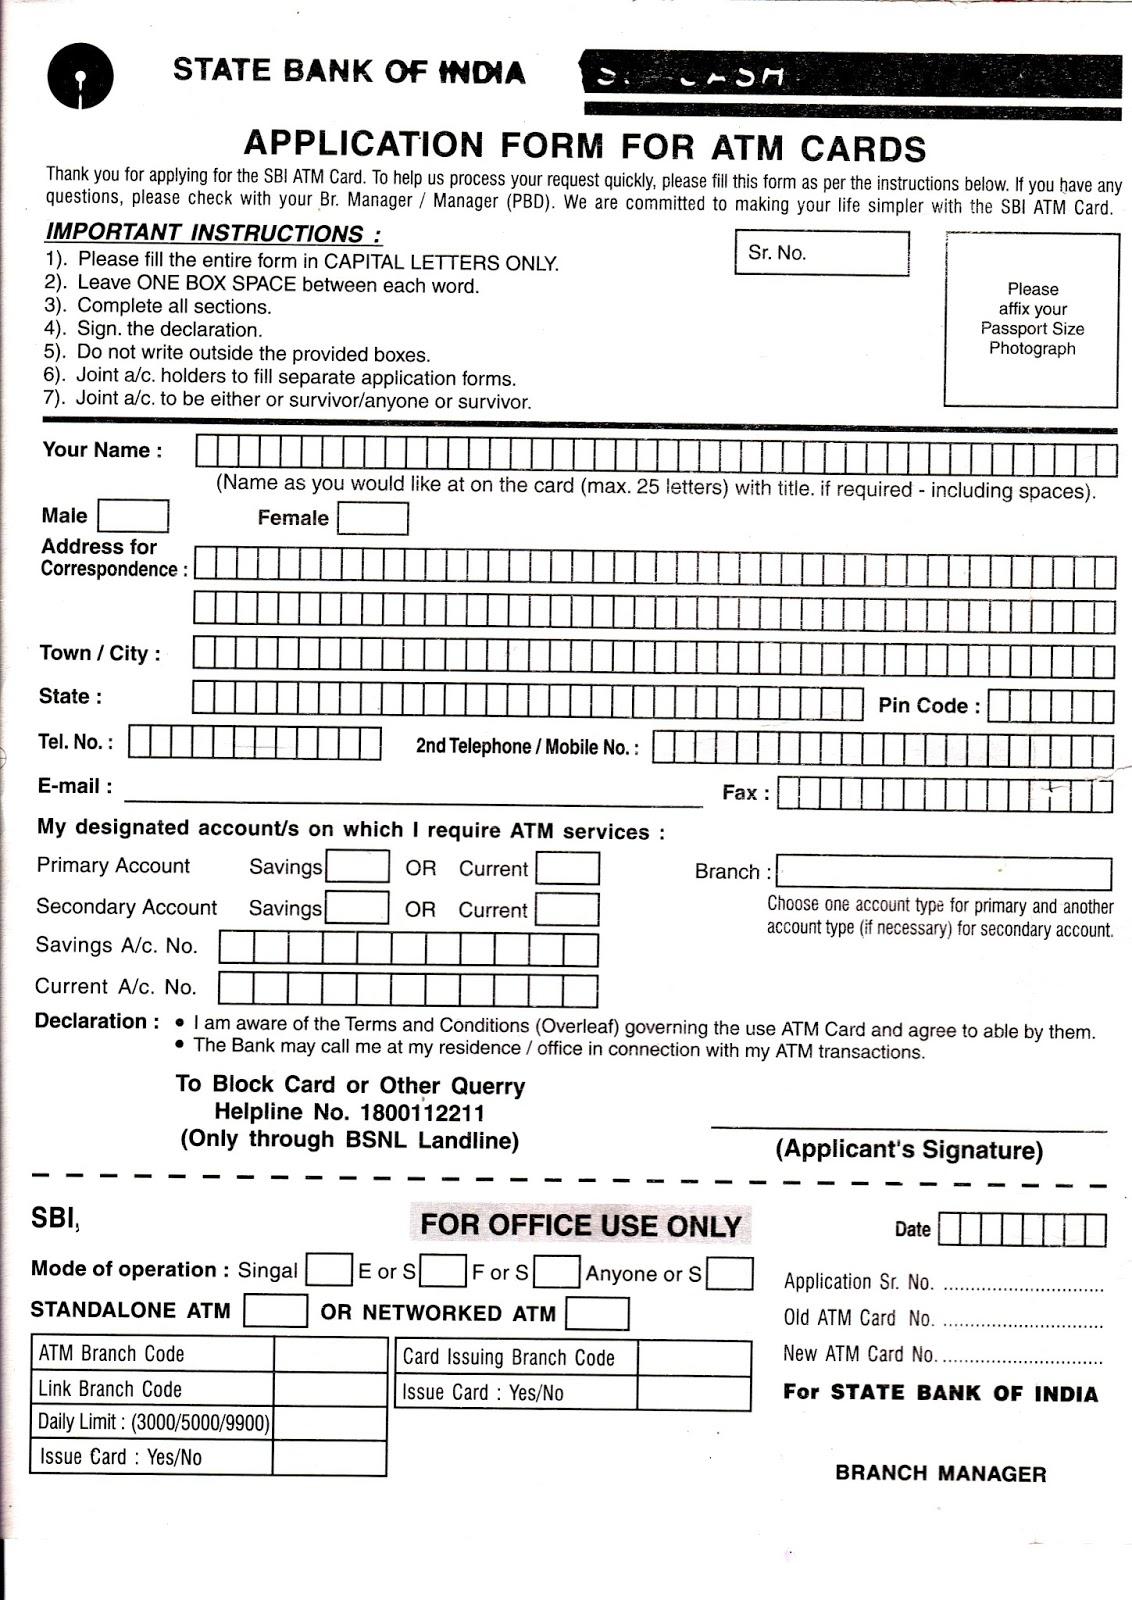 Online free stuff sbi atm card application form state bank of india sbi atm card application form state bank of india thecheapjerseys Images